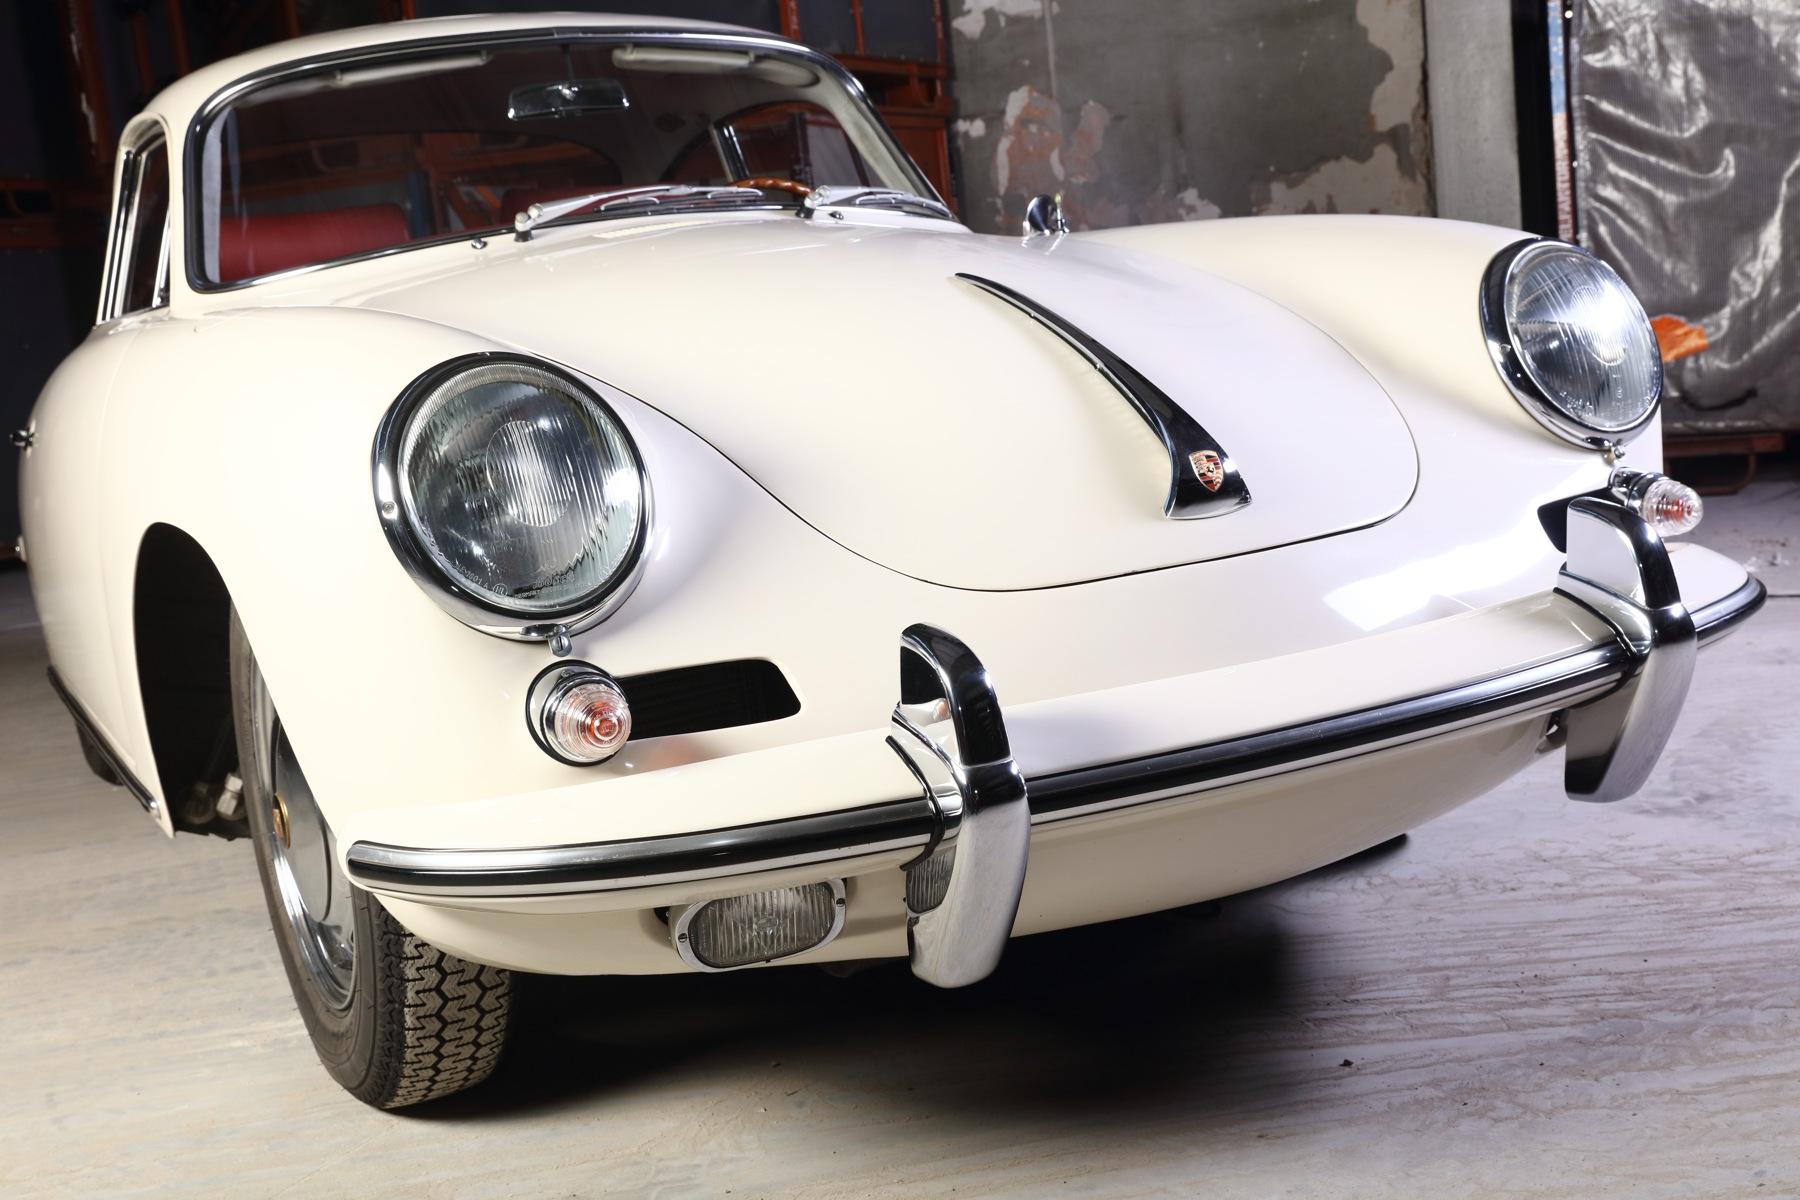 003 Porsche Carrera 2_072